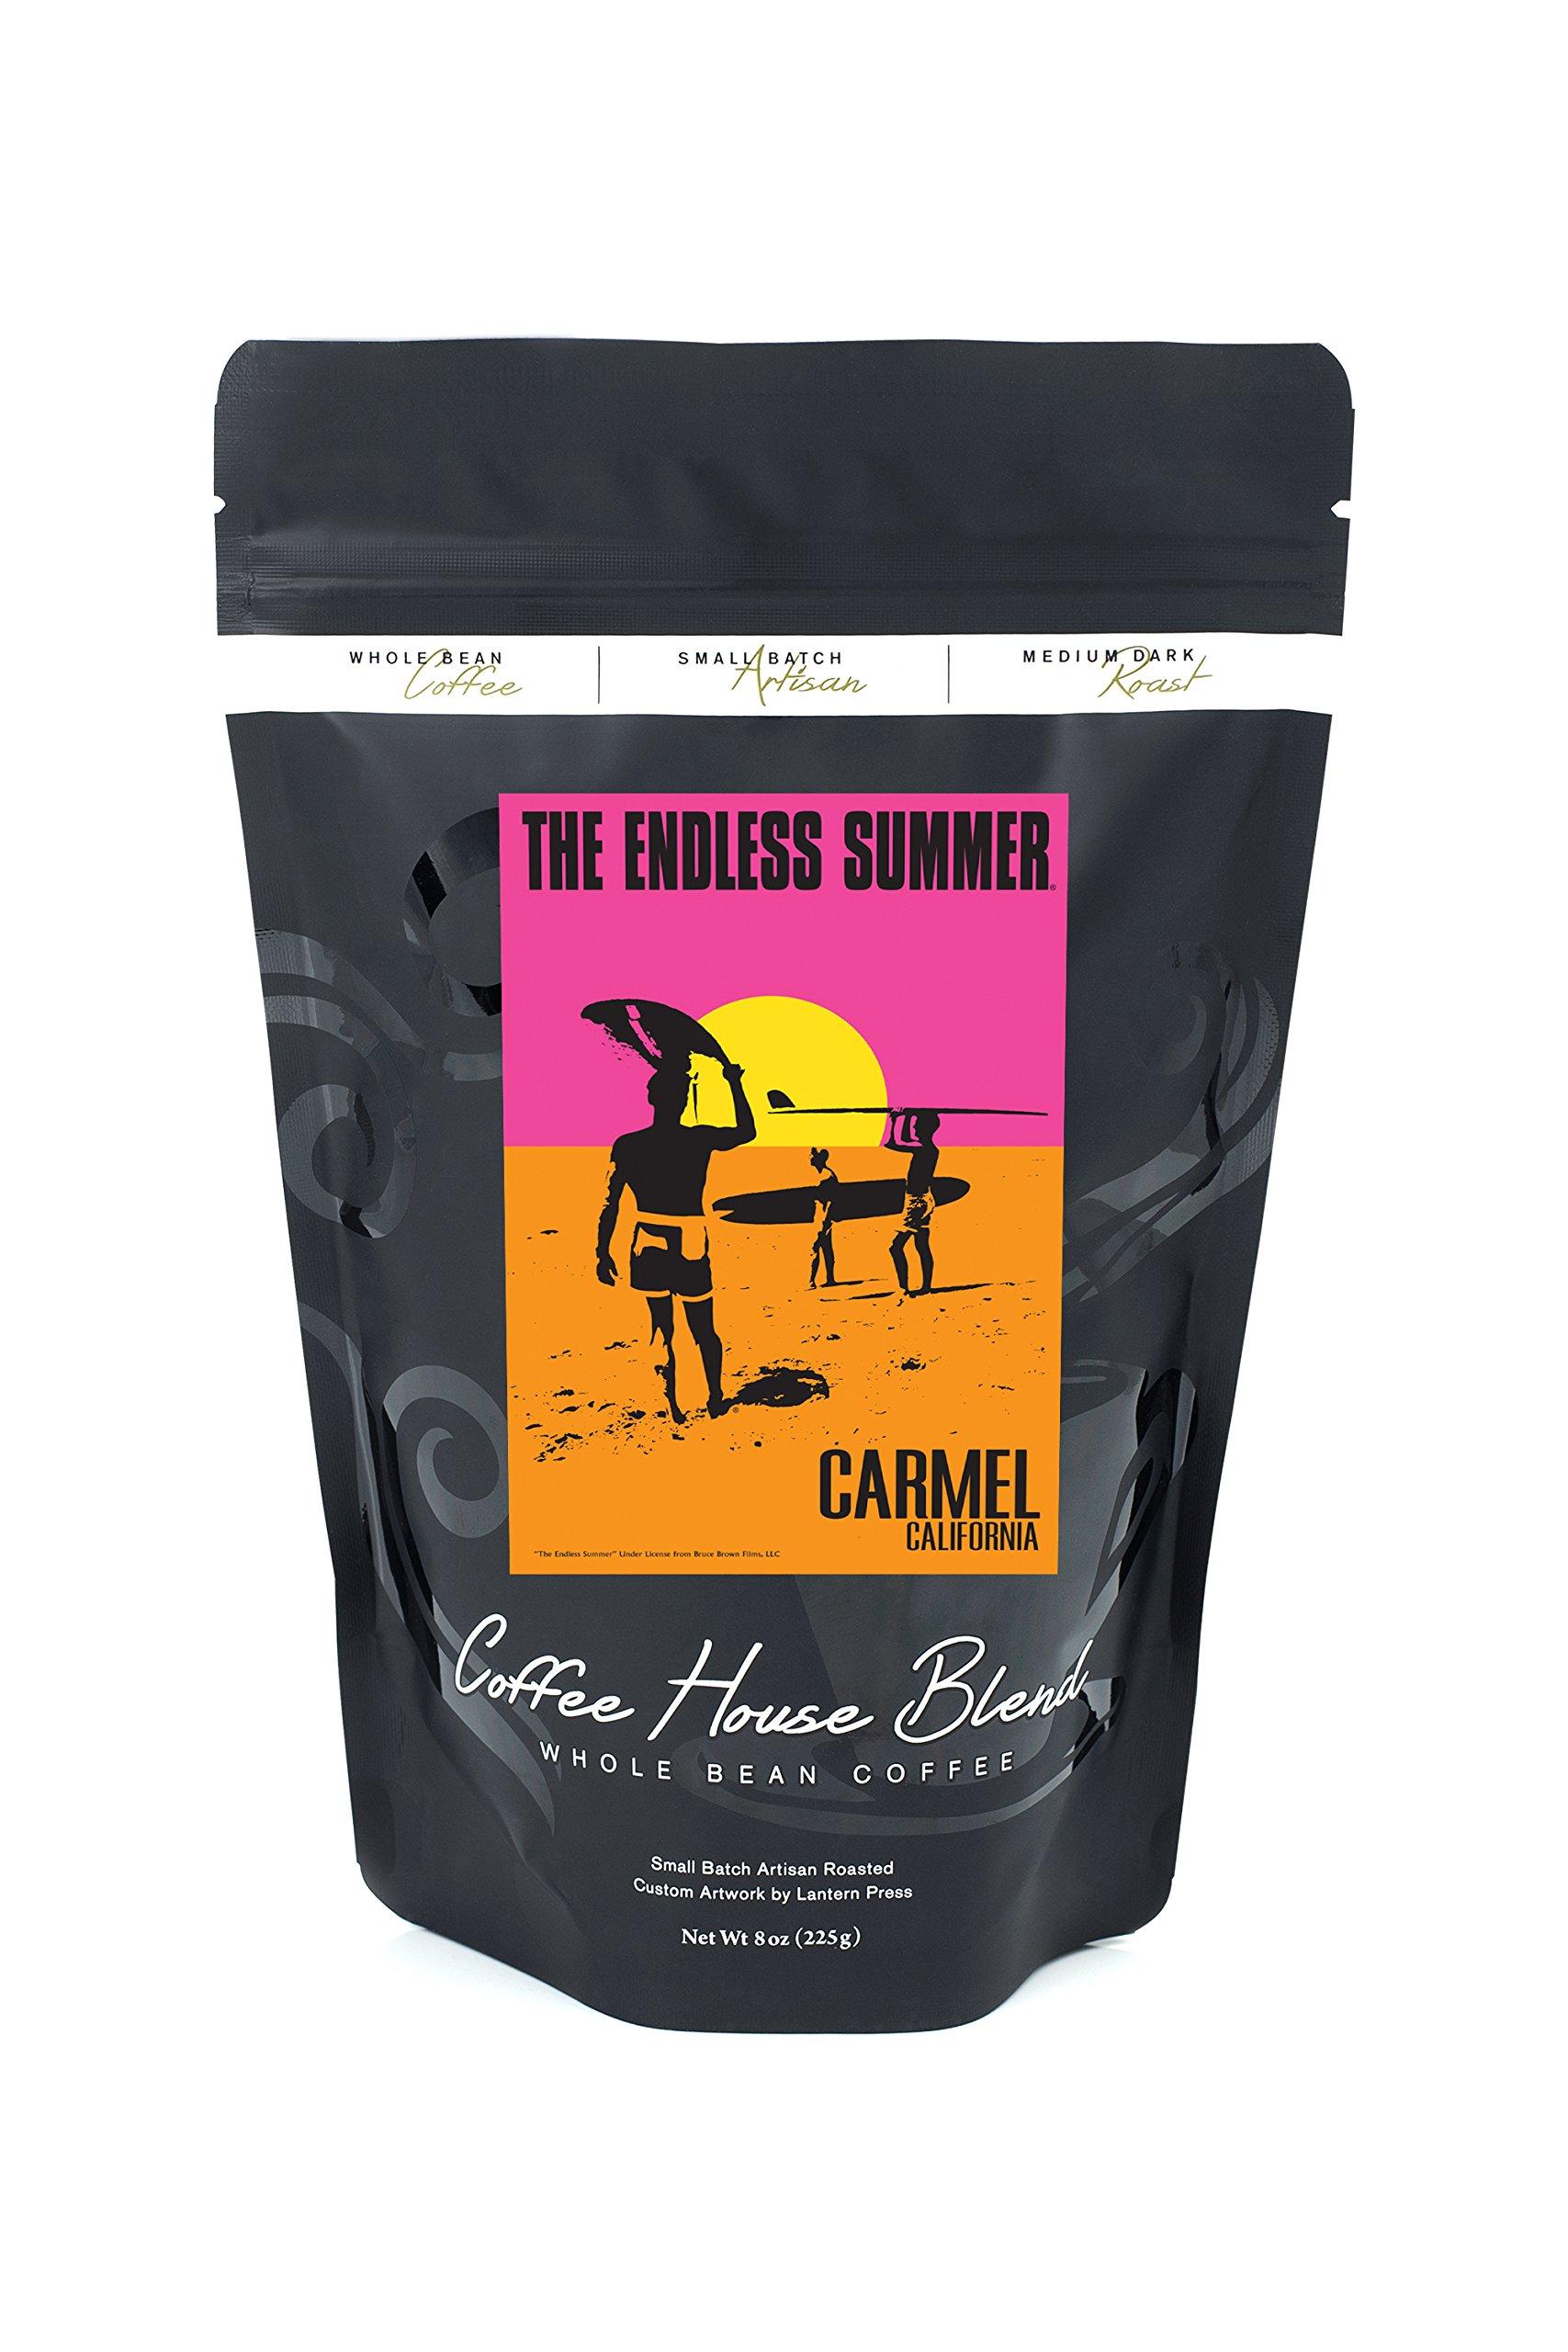 Carmel, California - The Endless Summer - Original Movie Poster (8oz Whole Bean Small Batch Artisan Coffee - Bold & Strong Medium Dark Roast w/ Artwork)